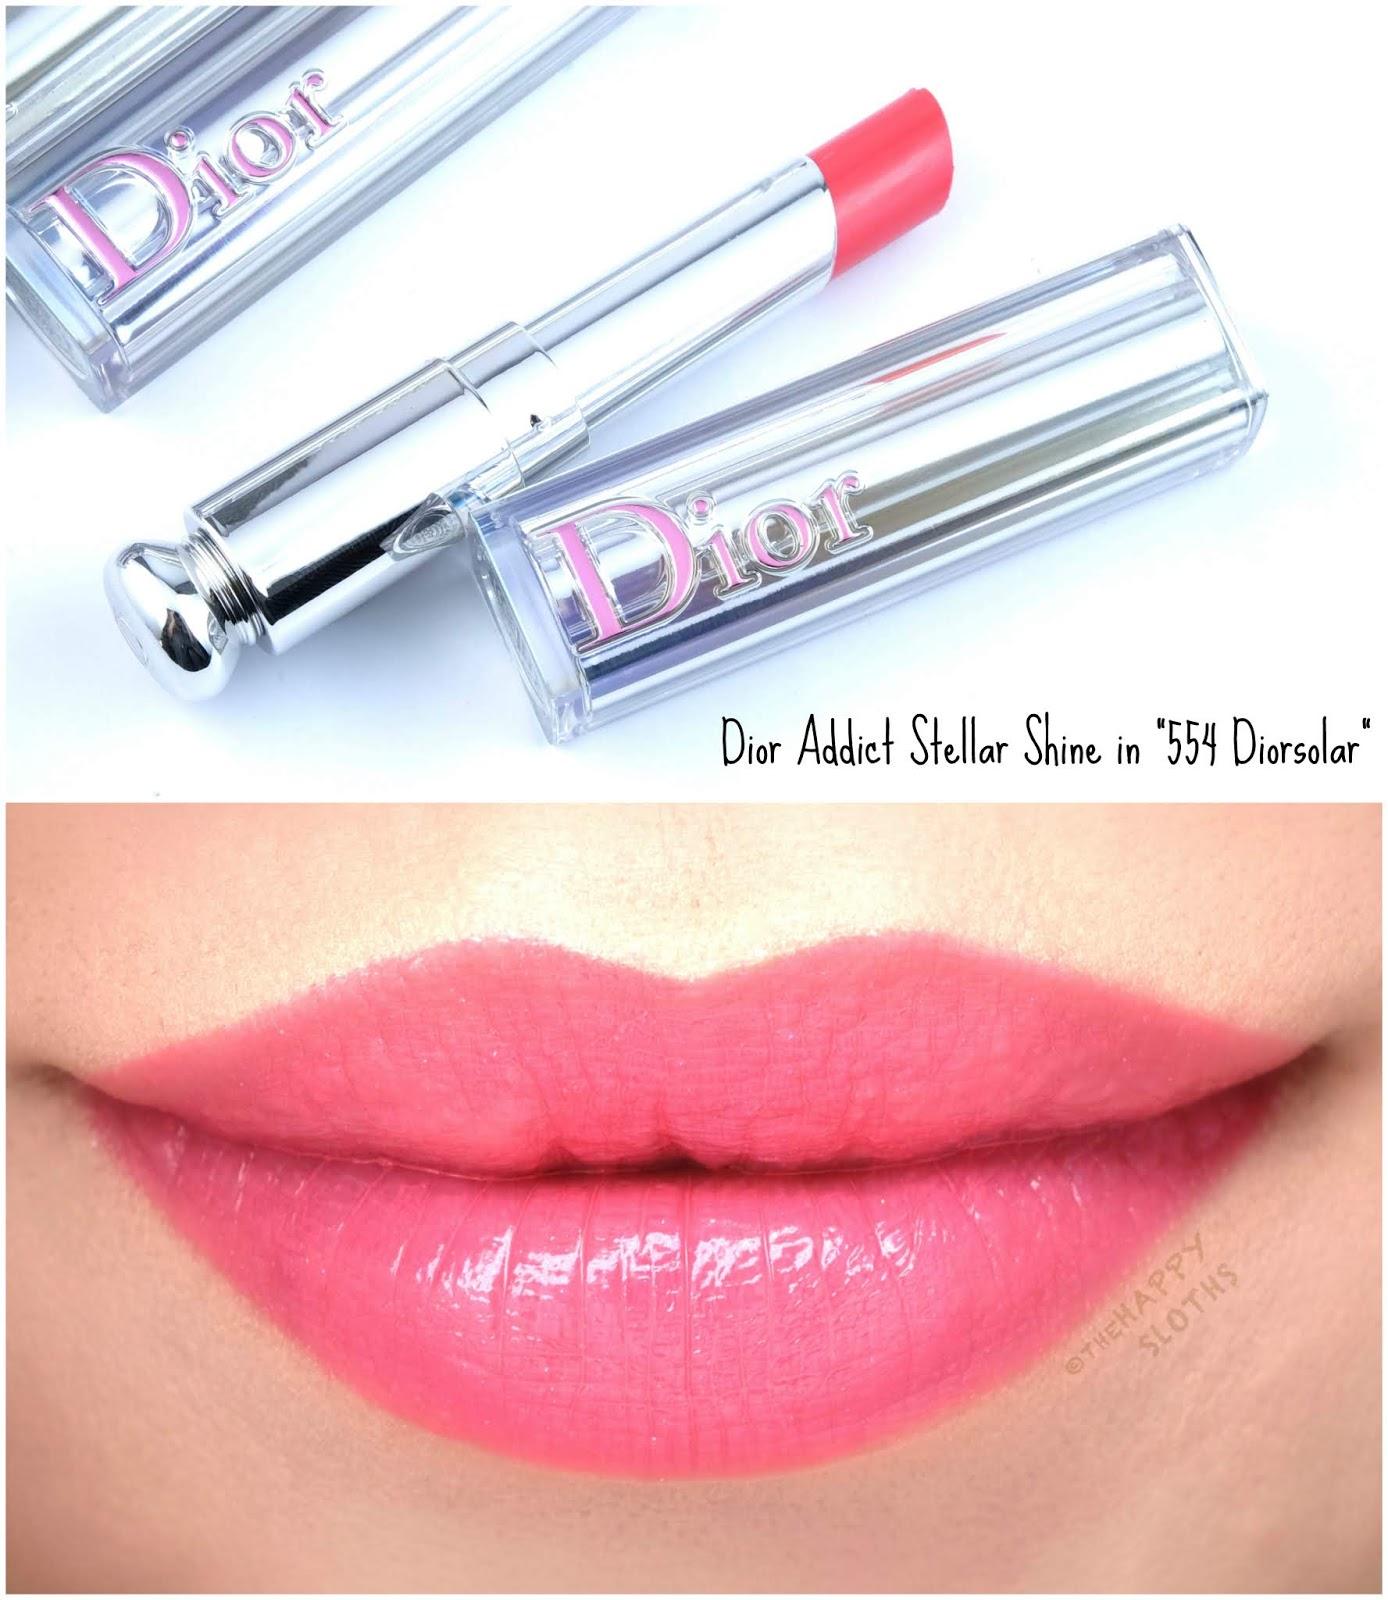 dior addict lipstick review 2016